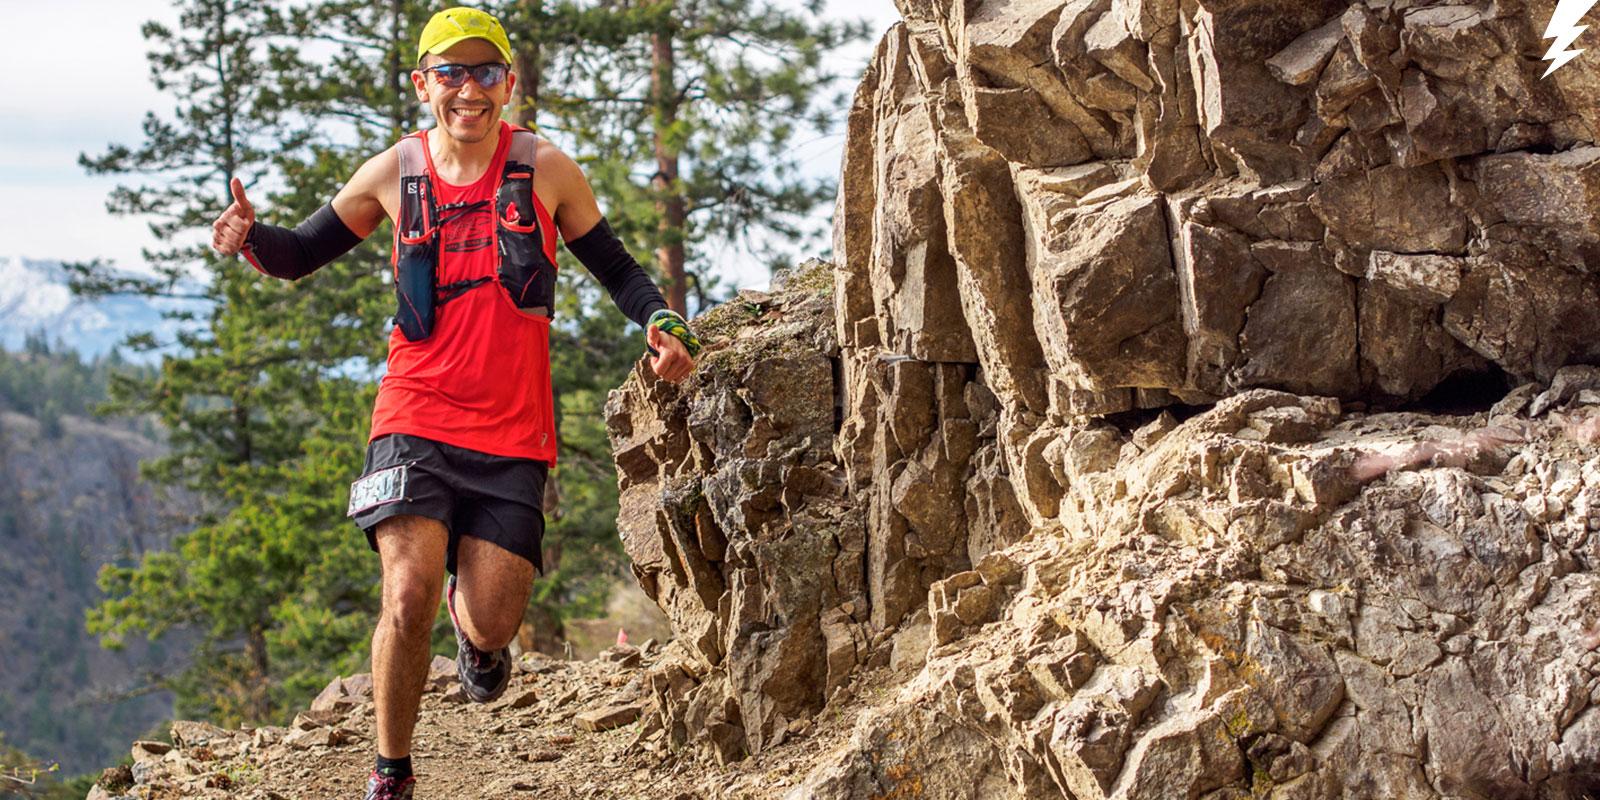 Nimble Bear 2017 - Race Photo Gallery